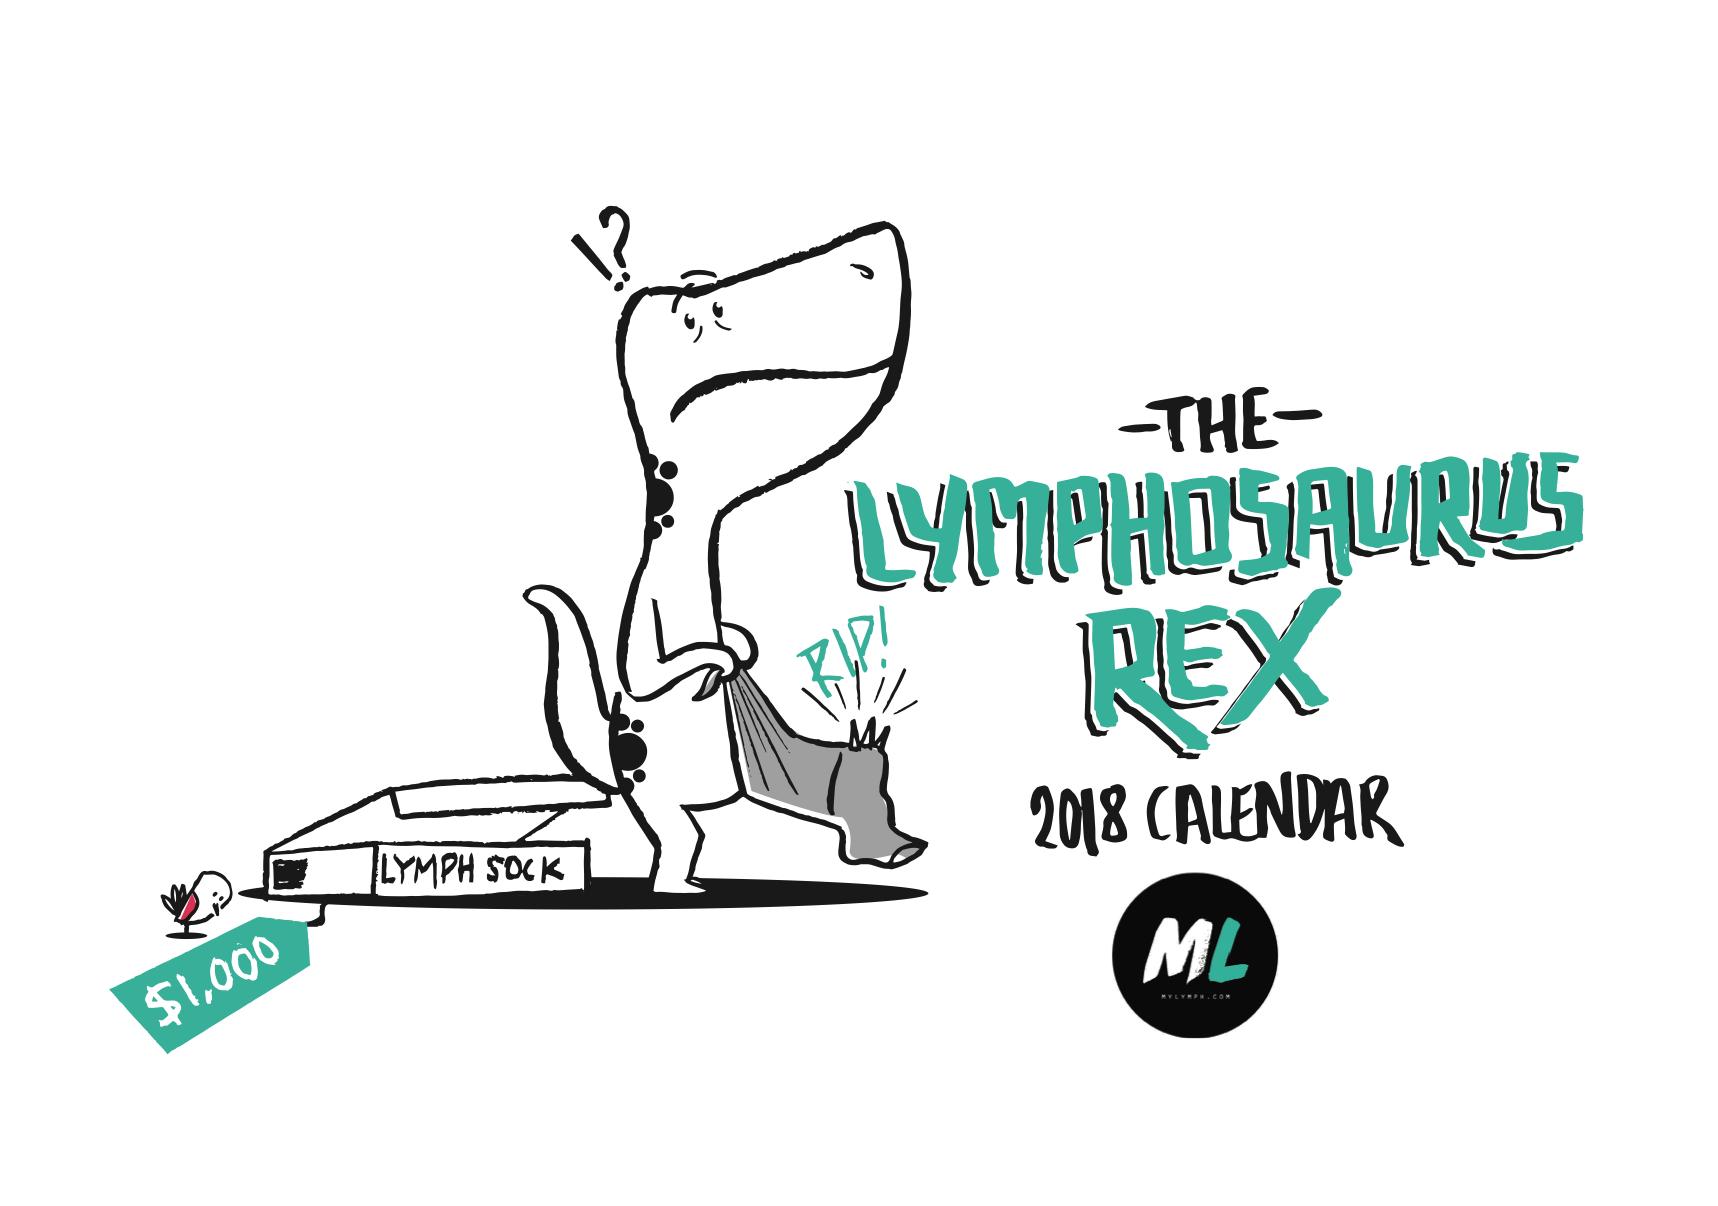 The Lymphosaurus Rex 2018 Calendar 00001